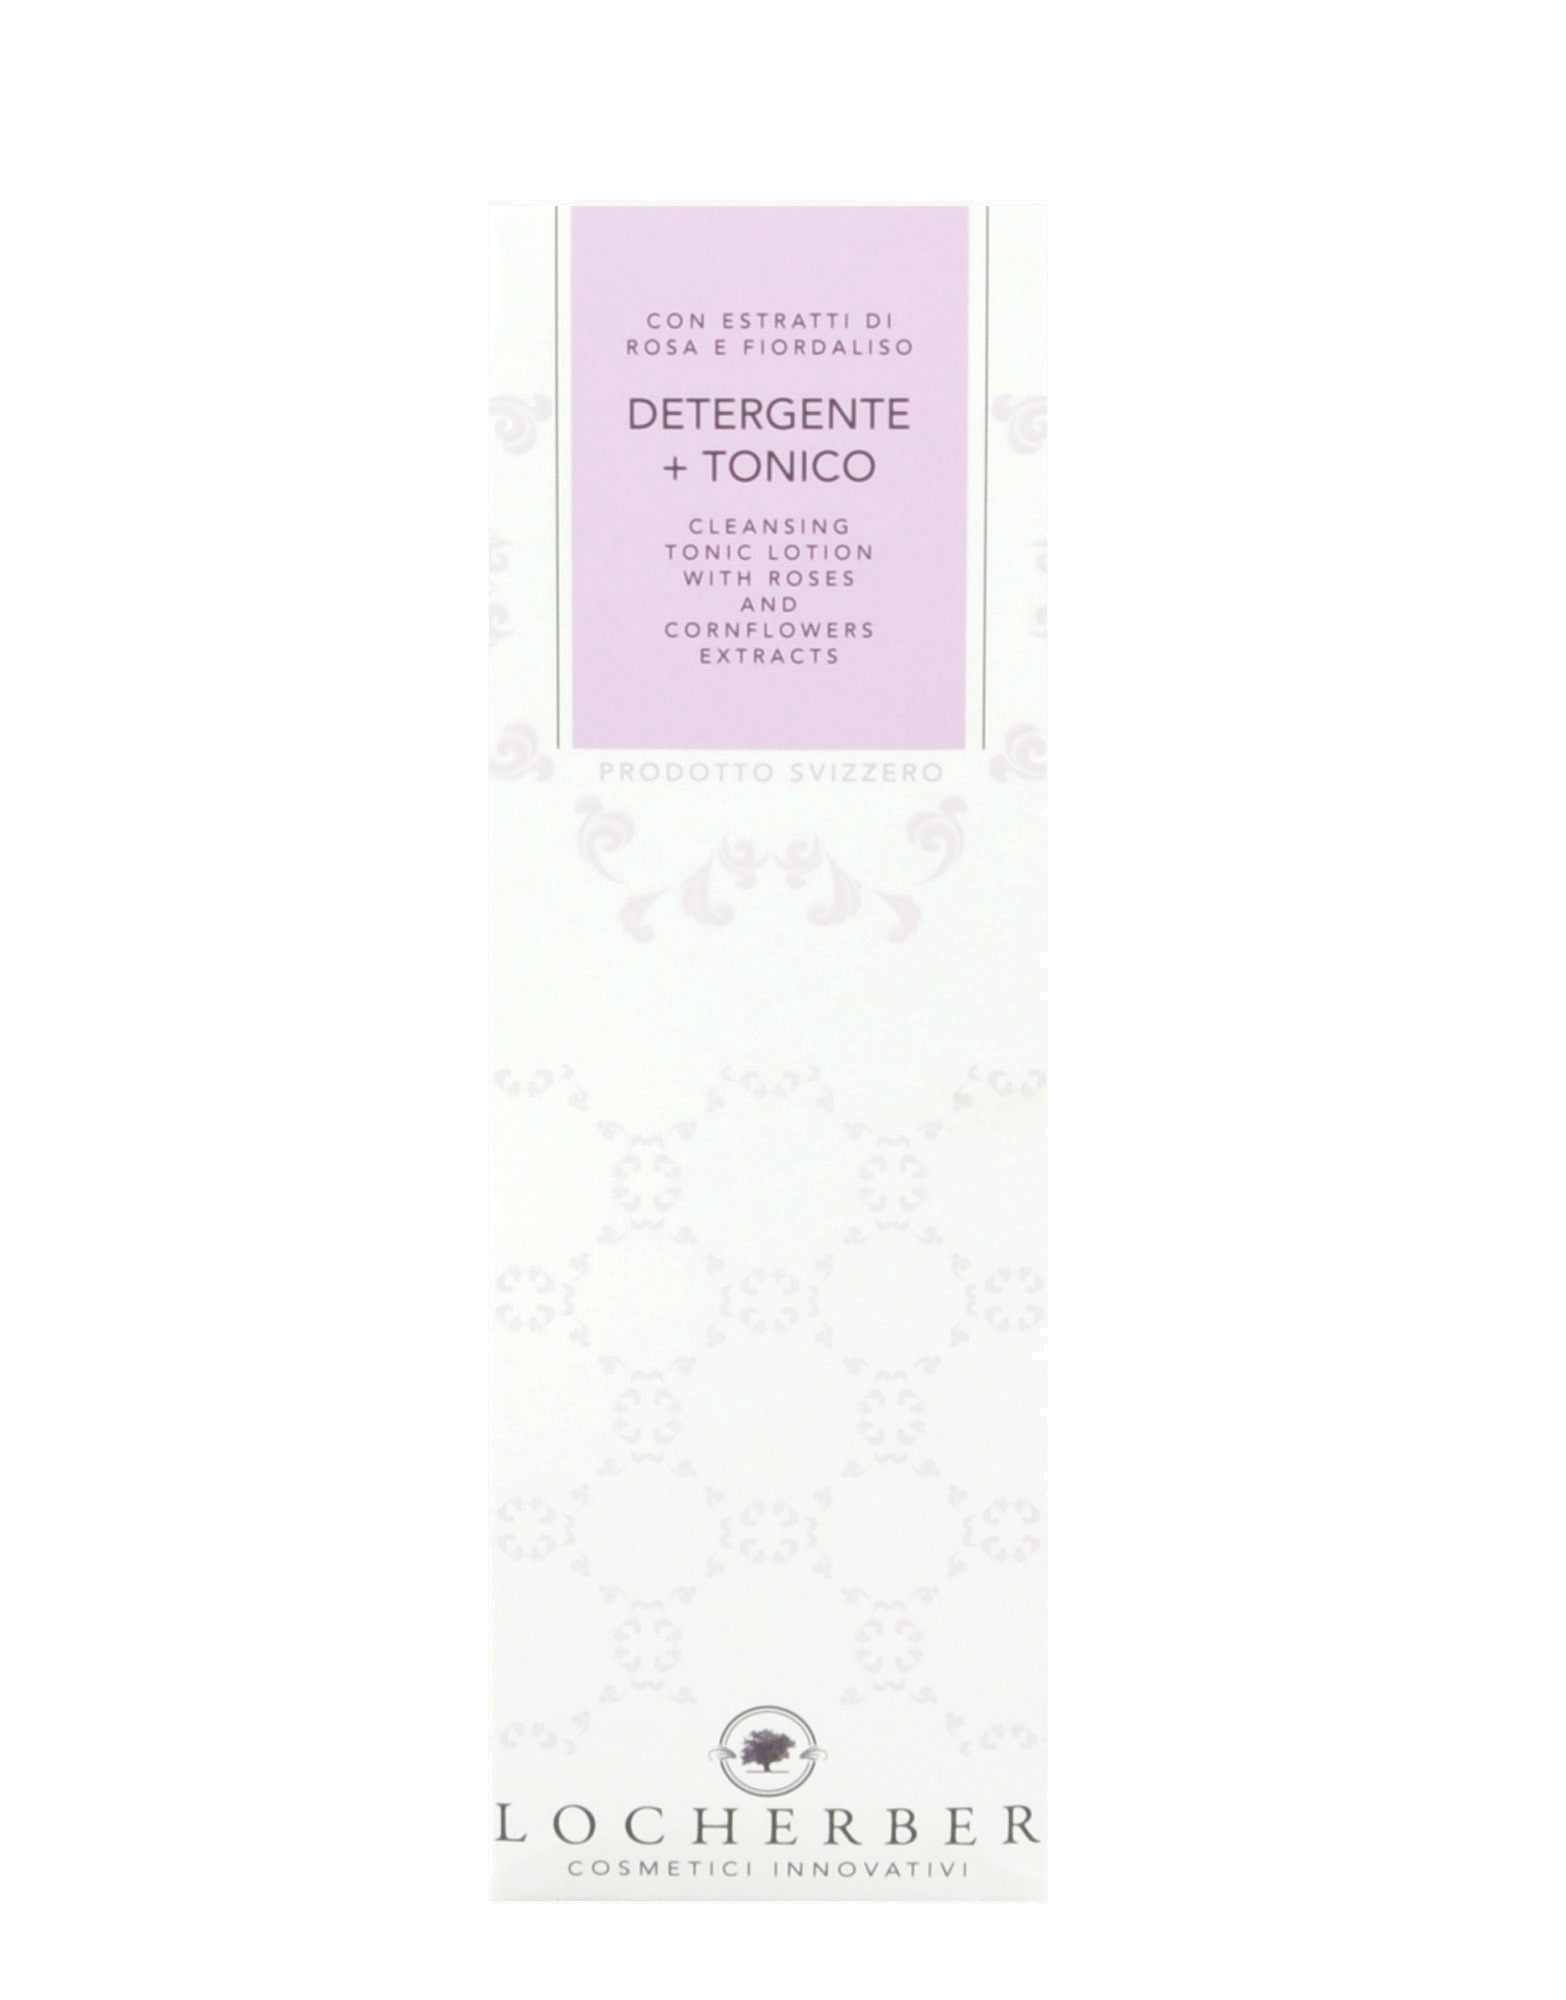 Detergente + Tonico di LOCHERBER (150ml)